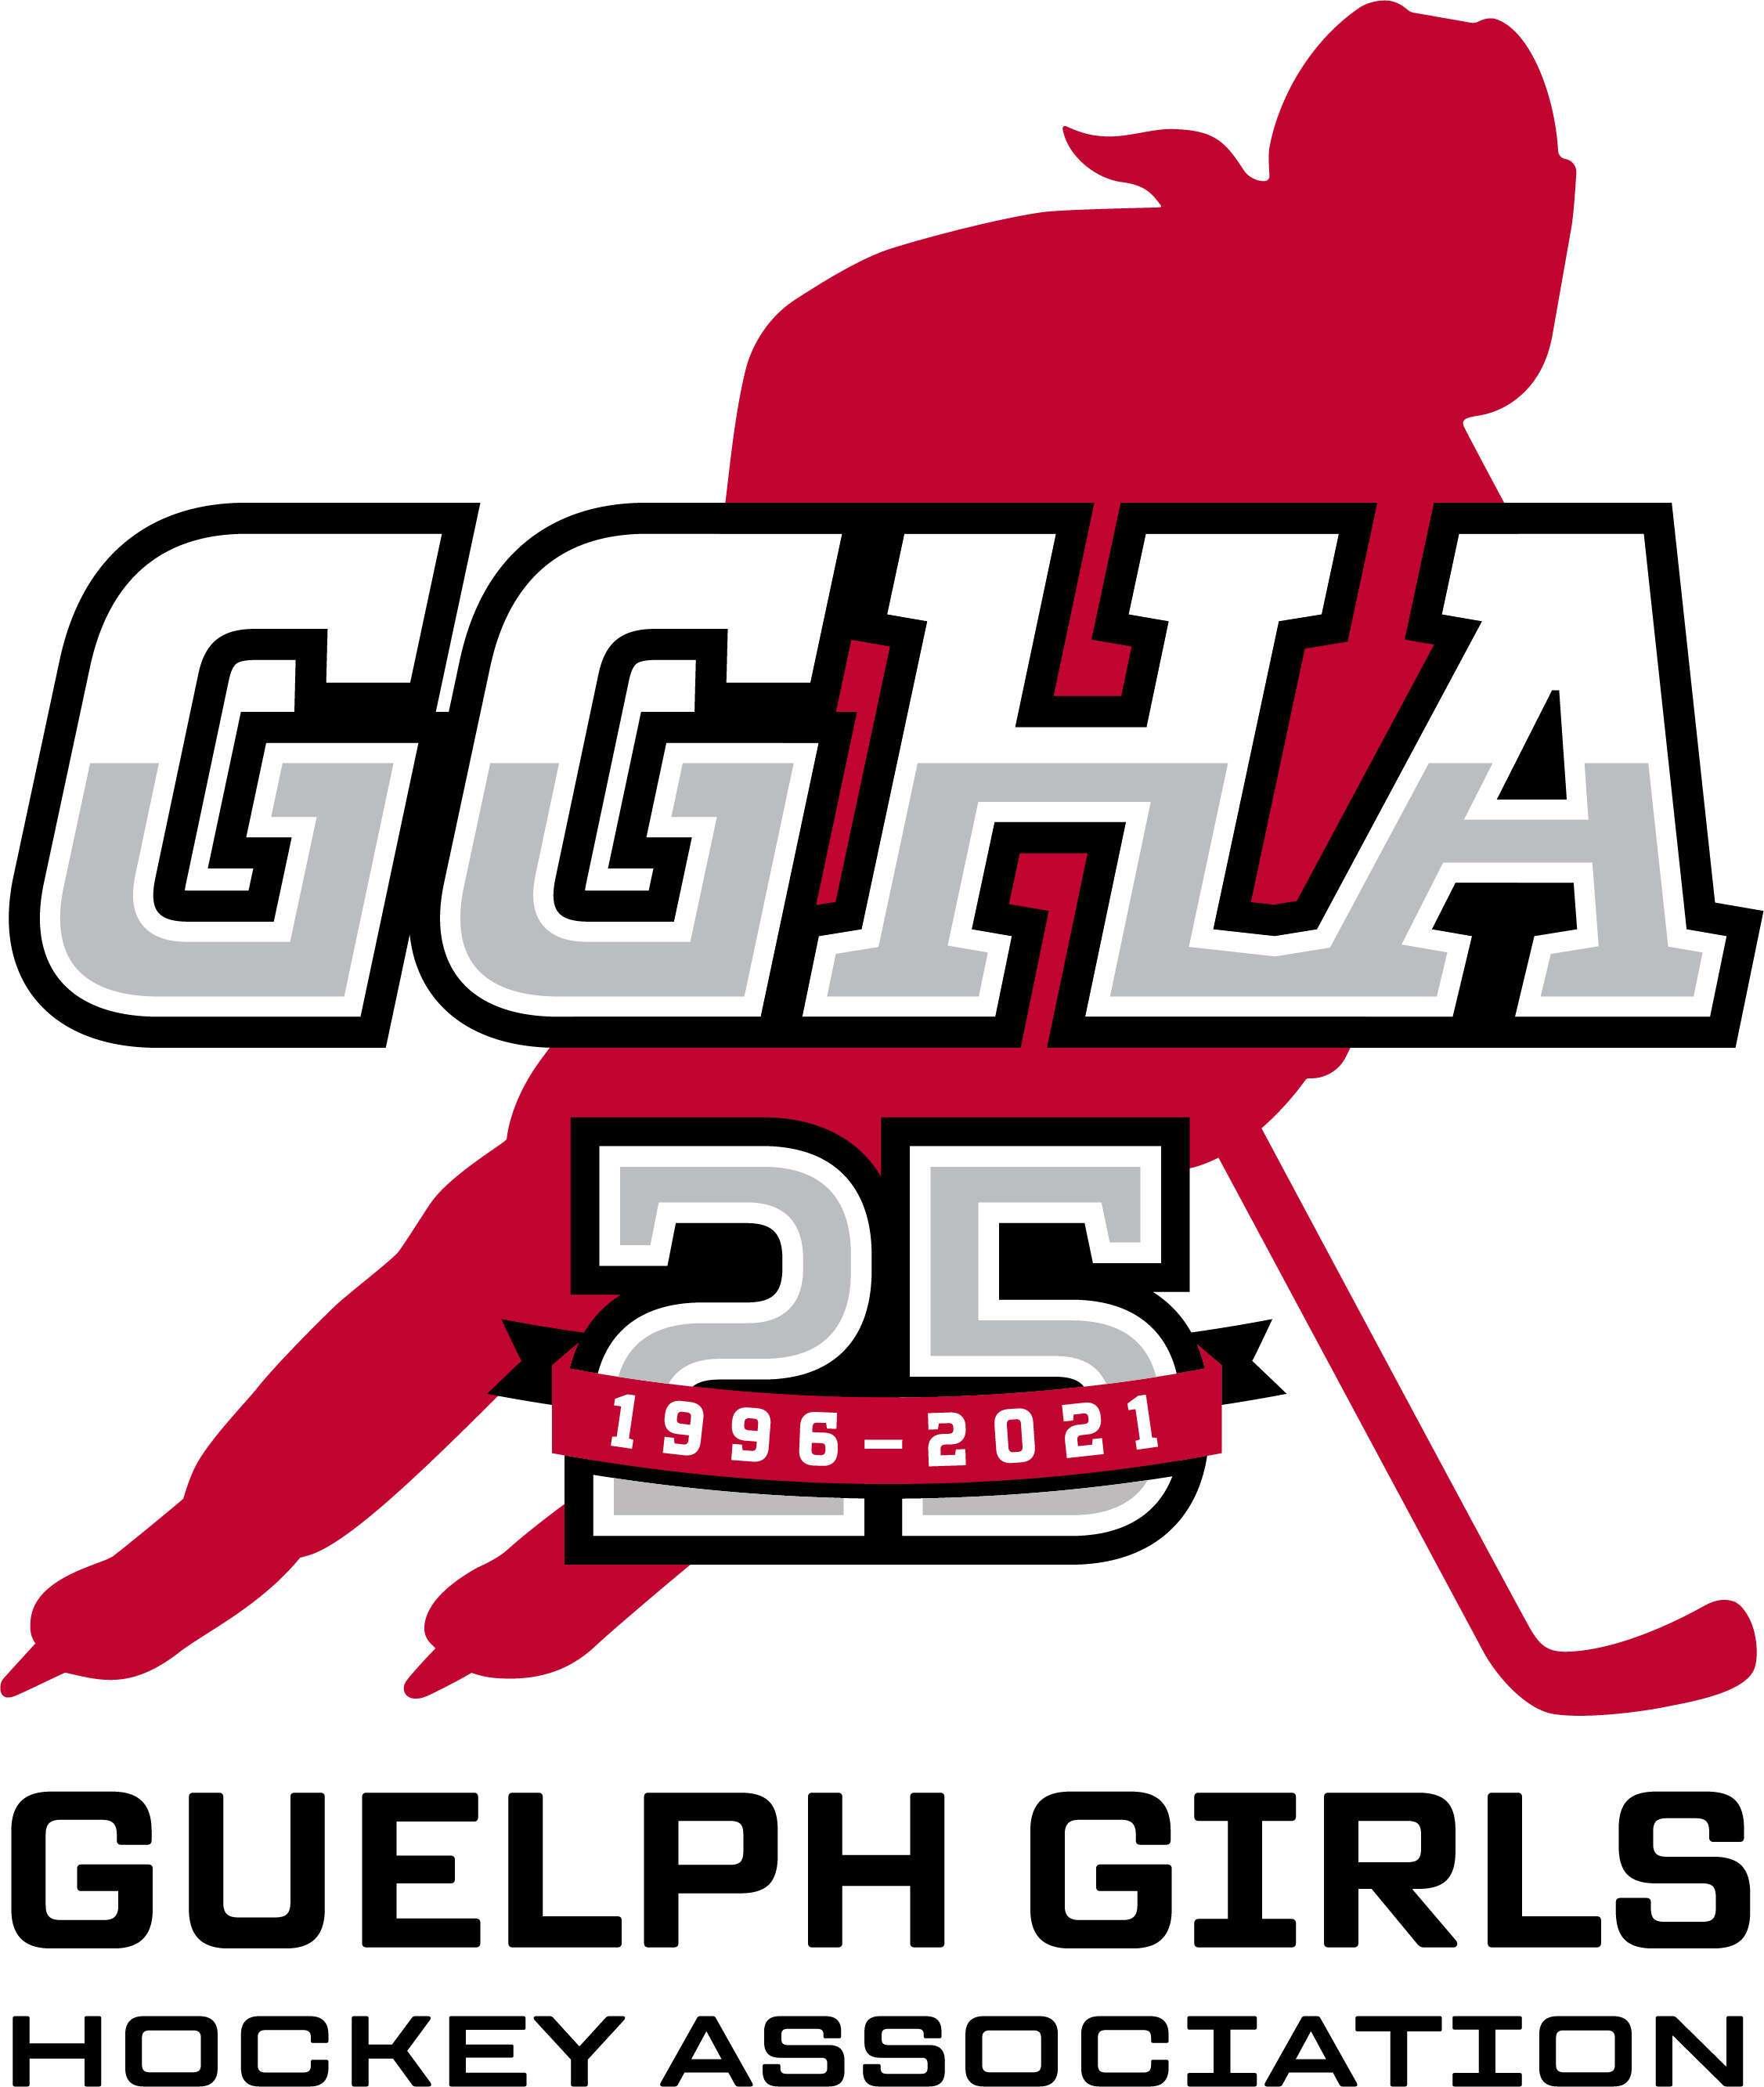 https://ggha.com/public/images/common/GGHA_Logo_25_RGB.jpg?rdm=0.9353789712547134